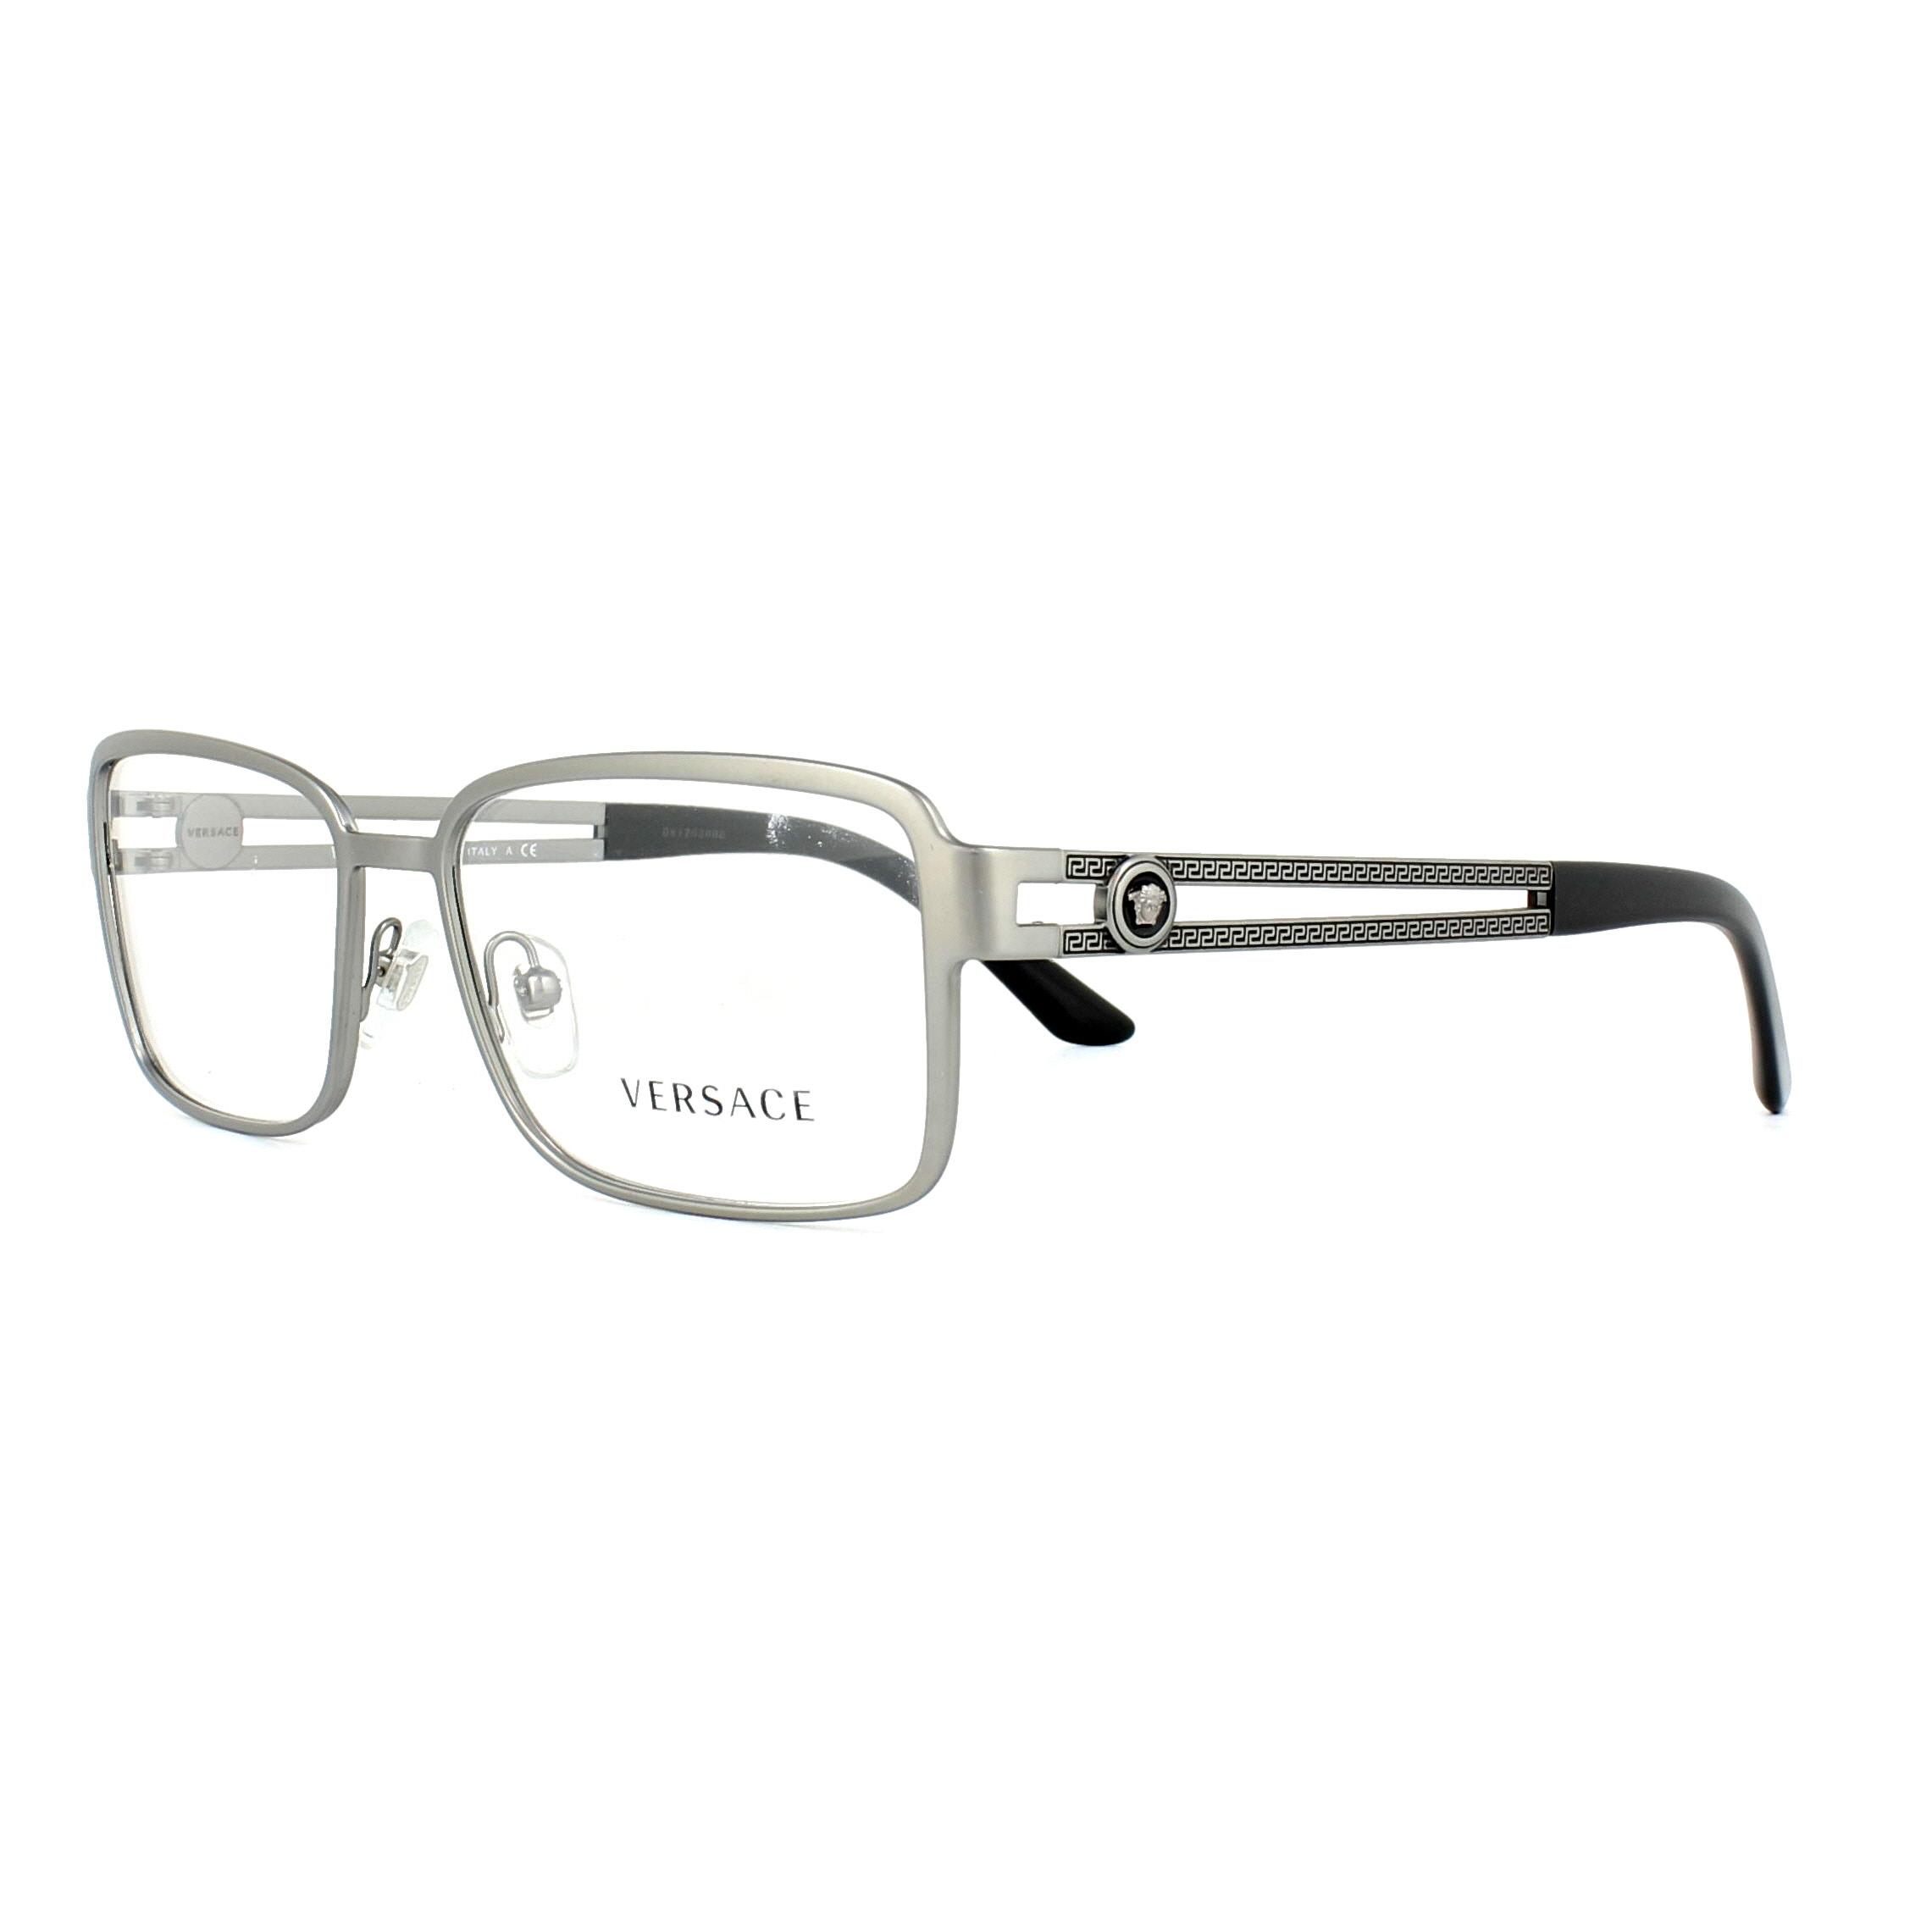 Versace Glasses Frames 1236 1351 Matte Gunmetal 55mm Mens ...